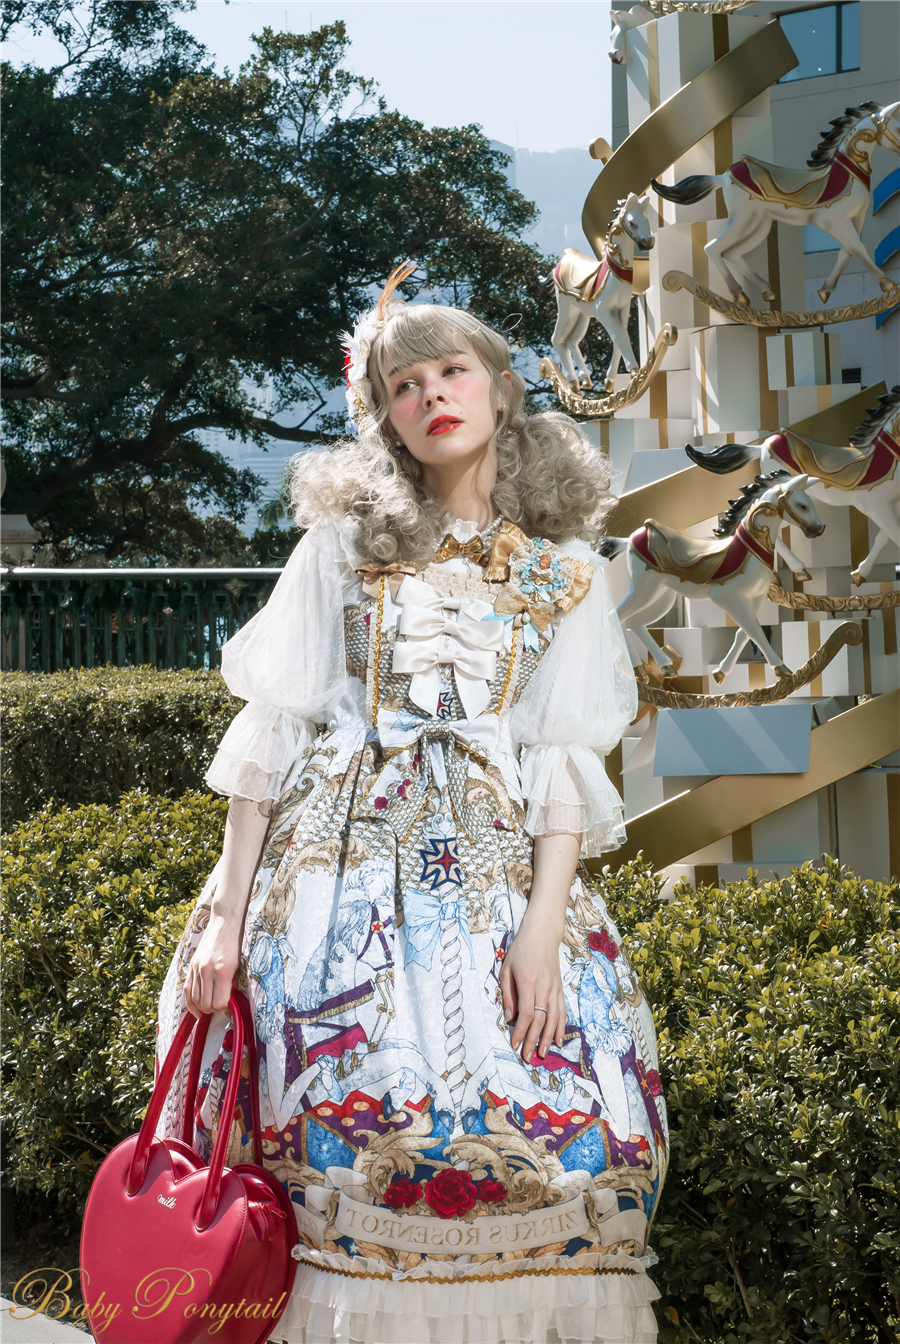 Baby Ponytail_Circus Princess_Silver JSK_Claudia15.jpg